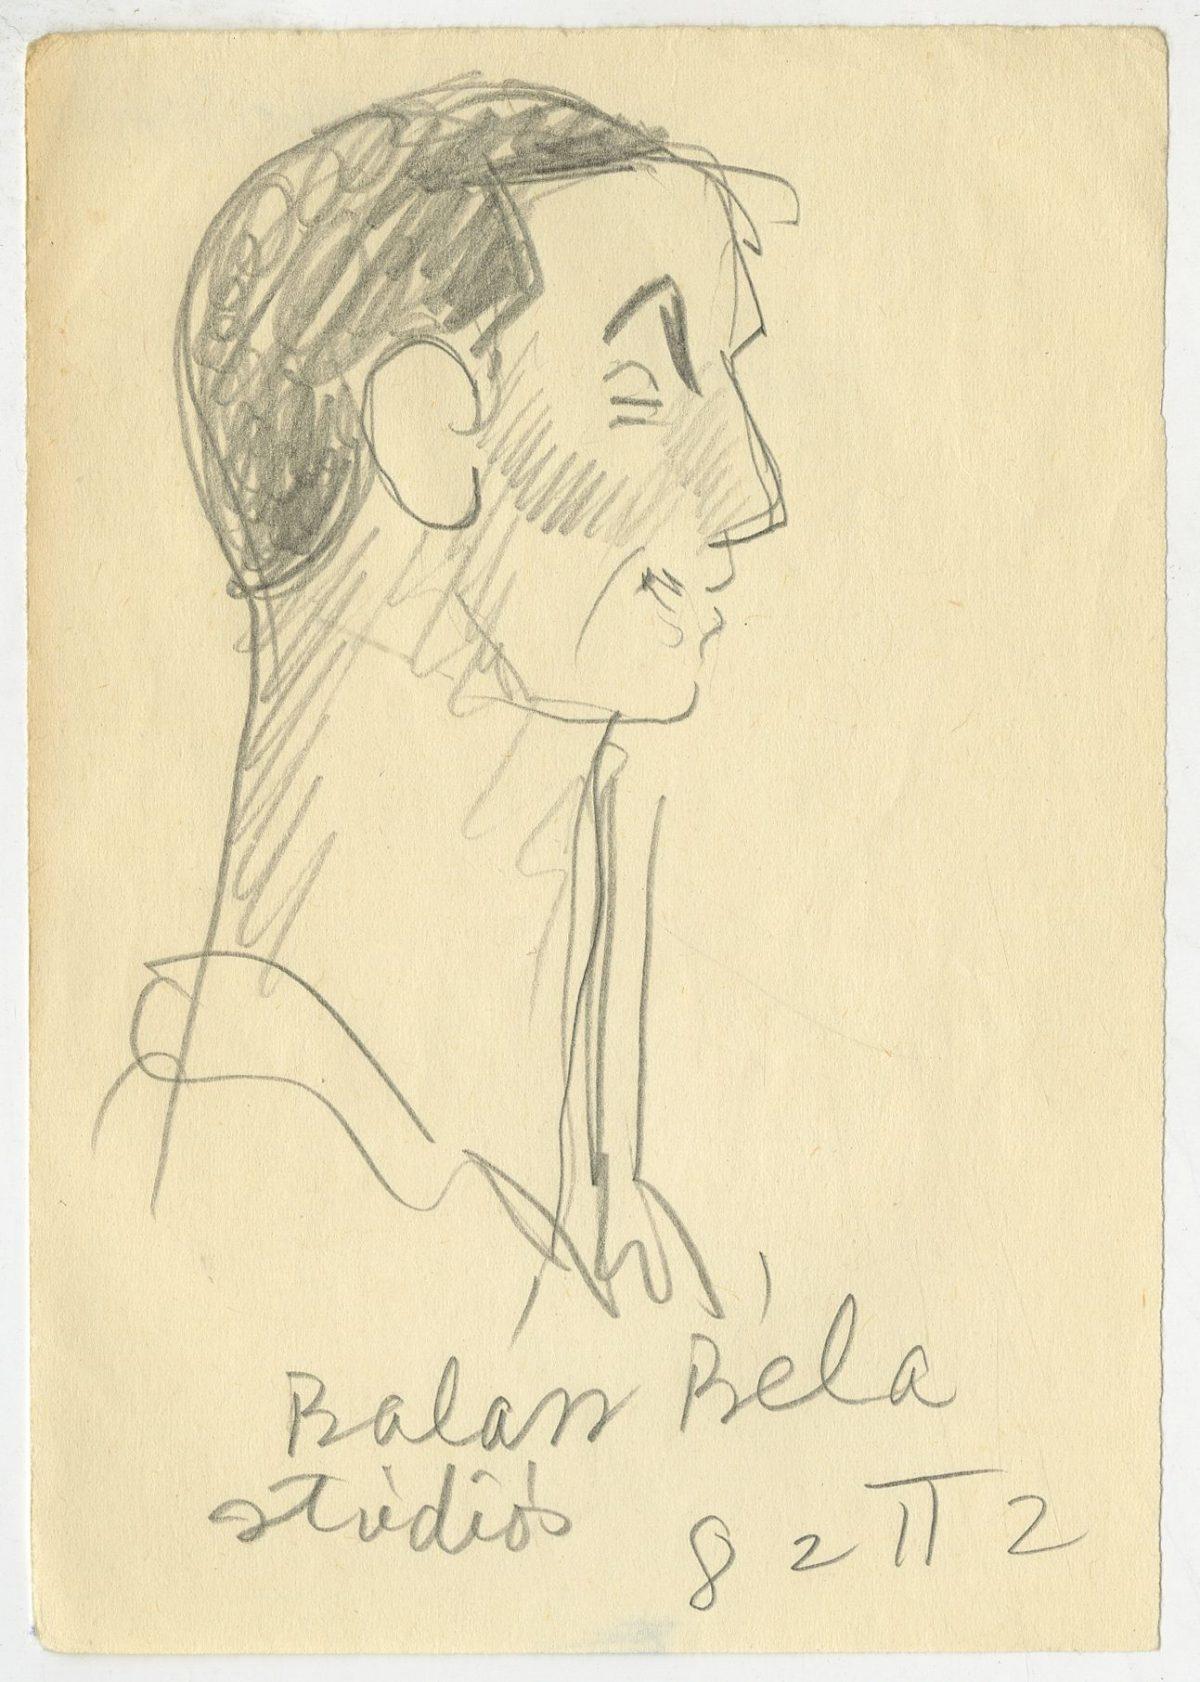 G41260(134)<br/> <b>Cím:</b> Balázs Béla stúdiós <br/> <b>Méret cm:</b> 14,8x10,4 <br/> <b>Készült:</b> 1982. <br/> <b>Technika:</b> ceruza<br/>